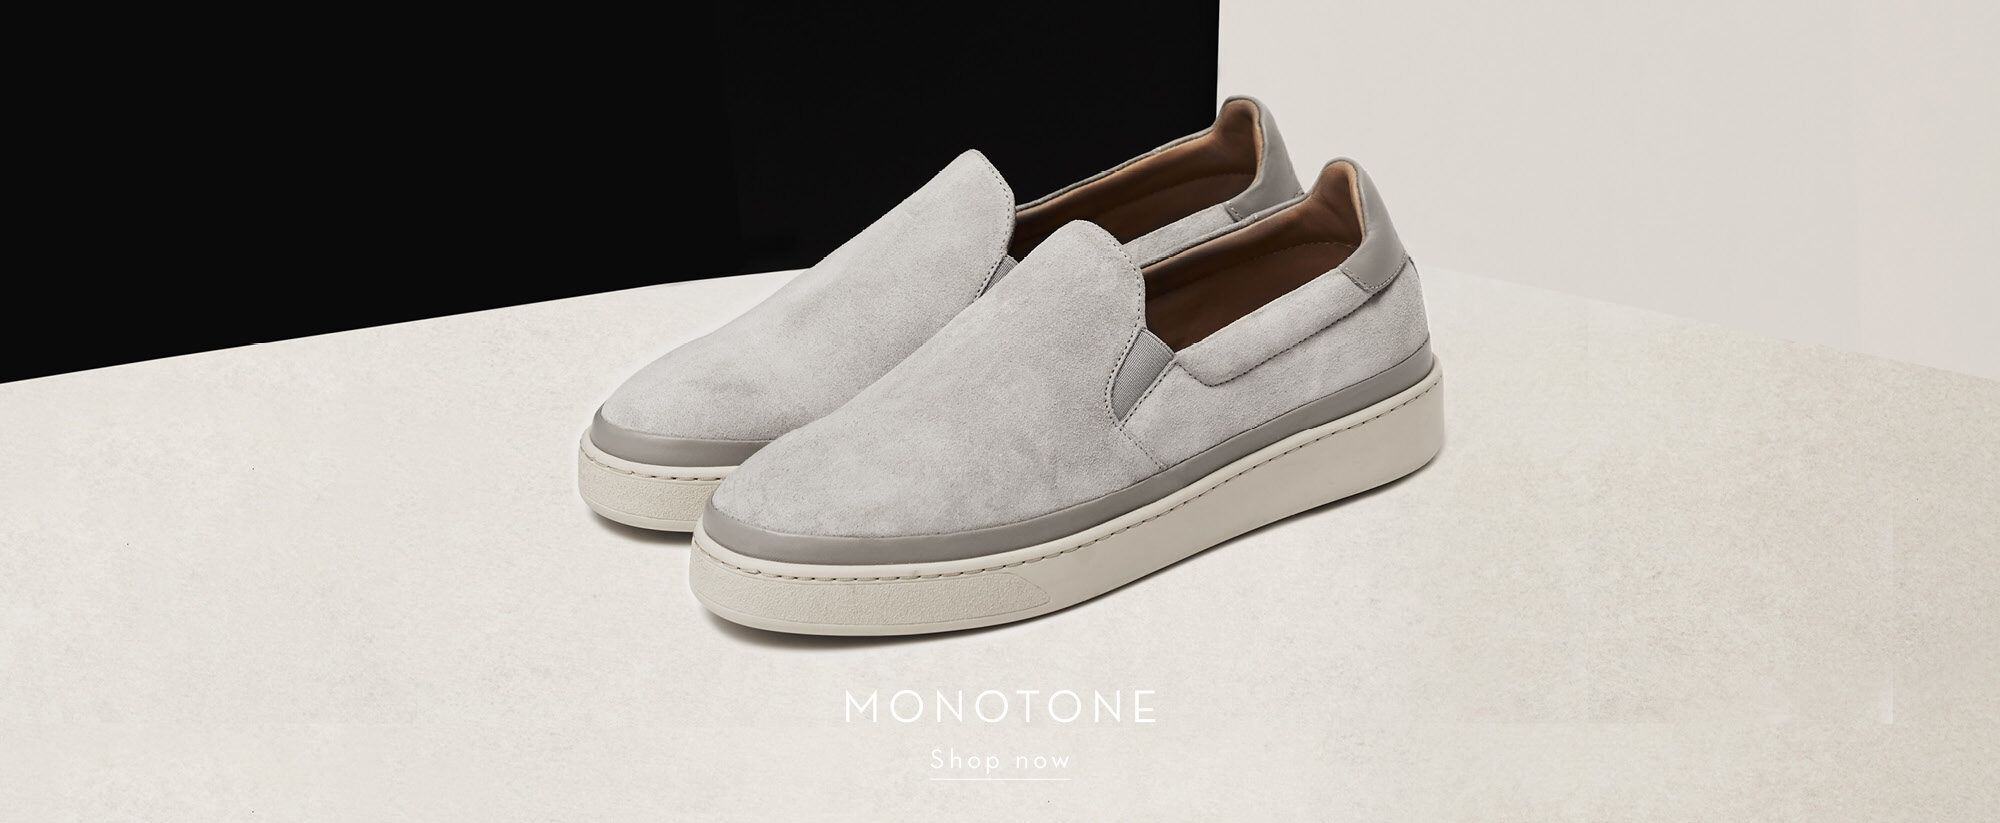 Monotone Mens Shoes - Grey Slip-on Mens Sneakers